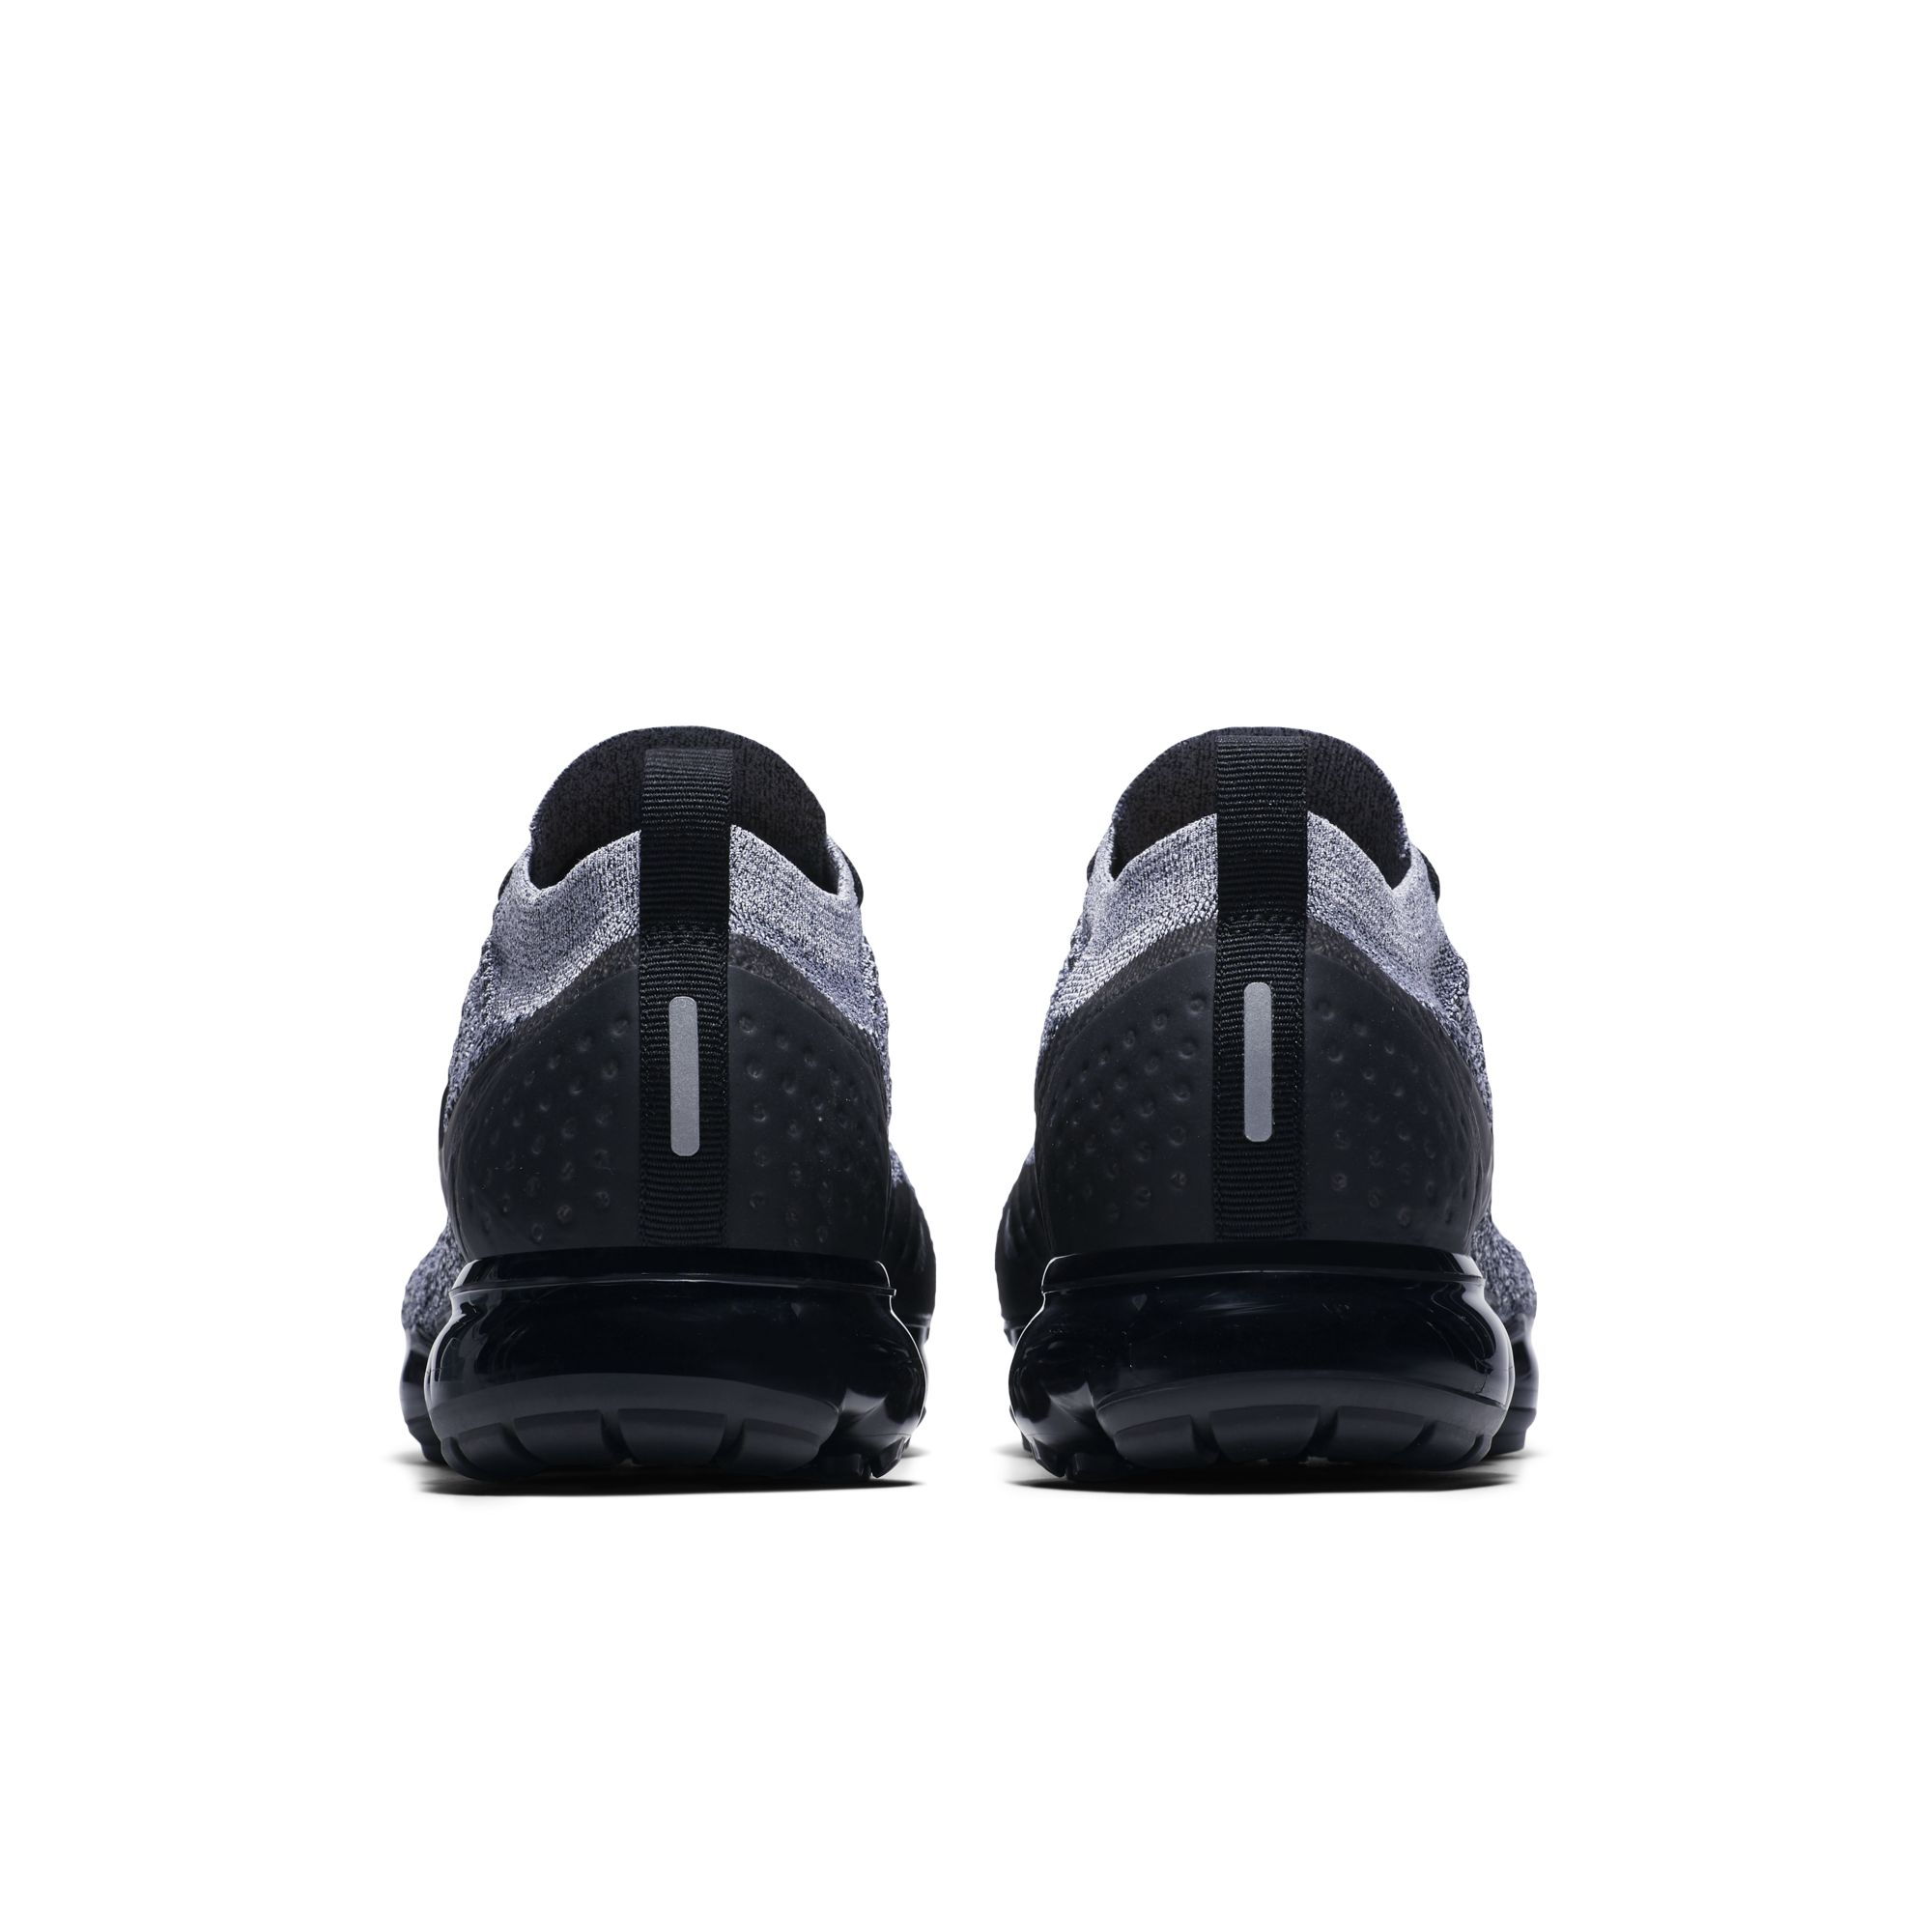 NIKE AIR VAPORMAX FLYKNIT 2 WHITE : BLACK-BLACK 4